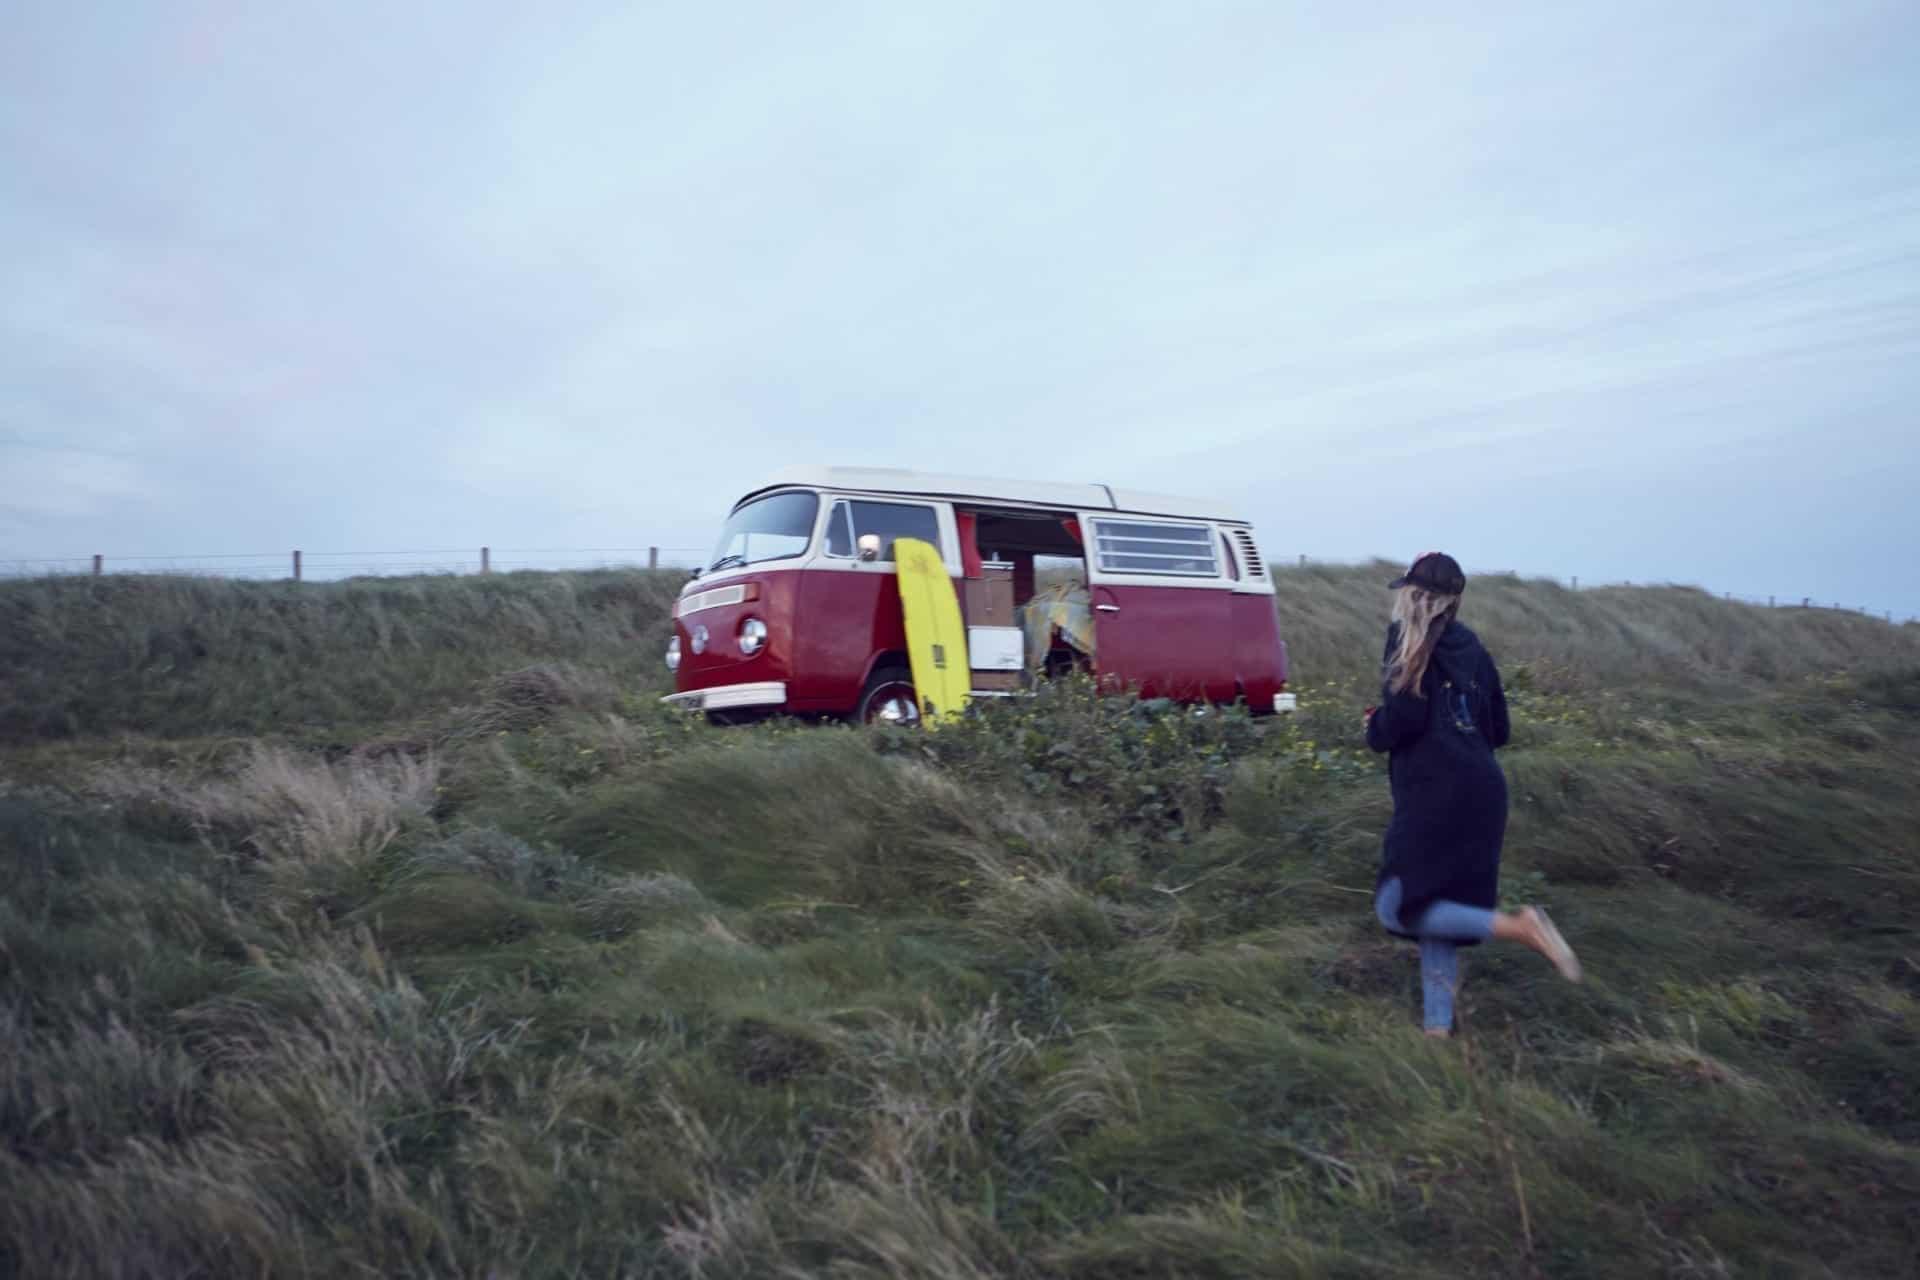 Red campervan near the beach